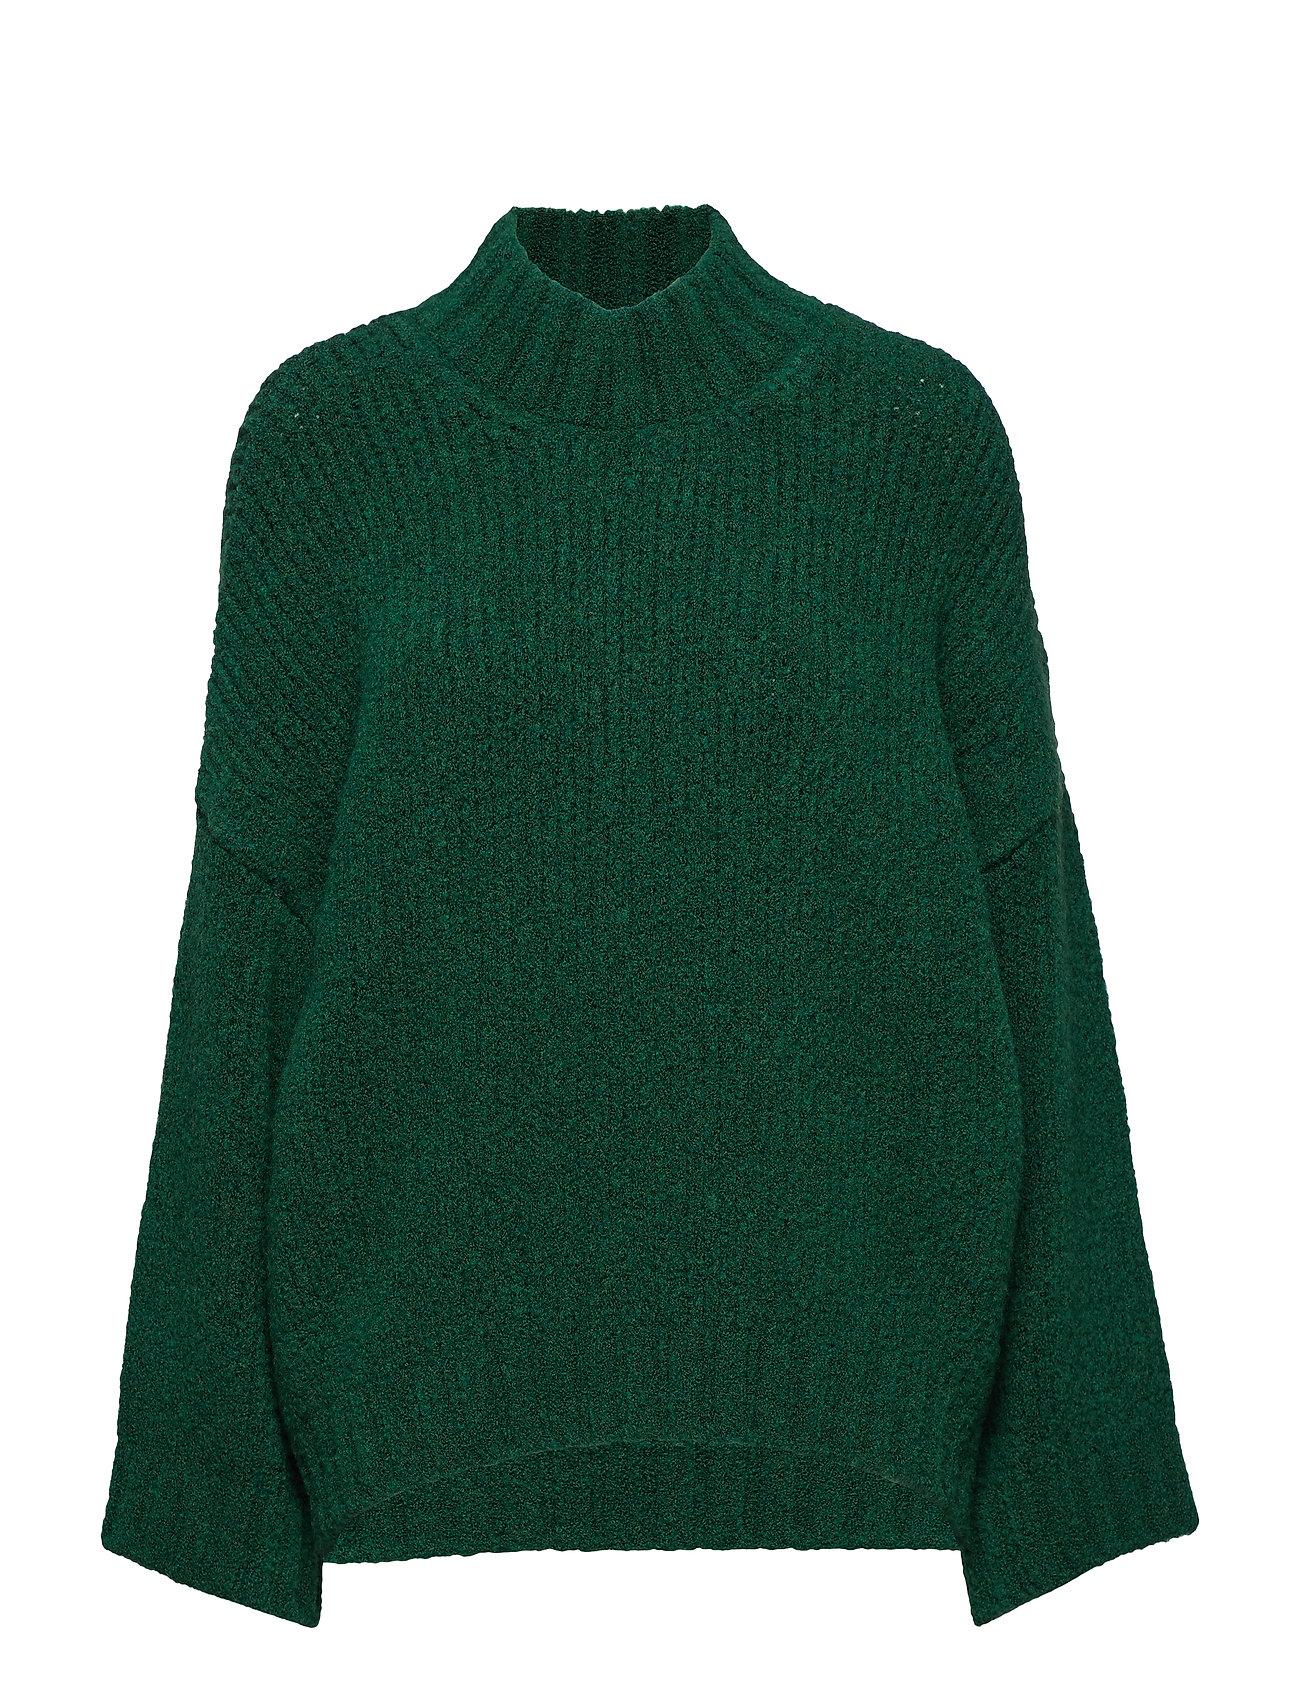 HOLZWEILER BOAR Knit - GREEN